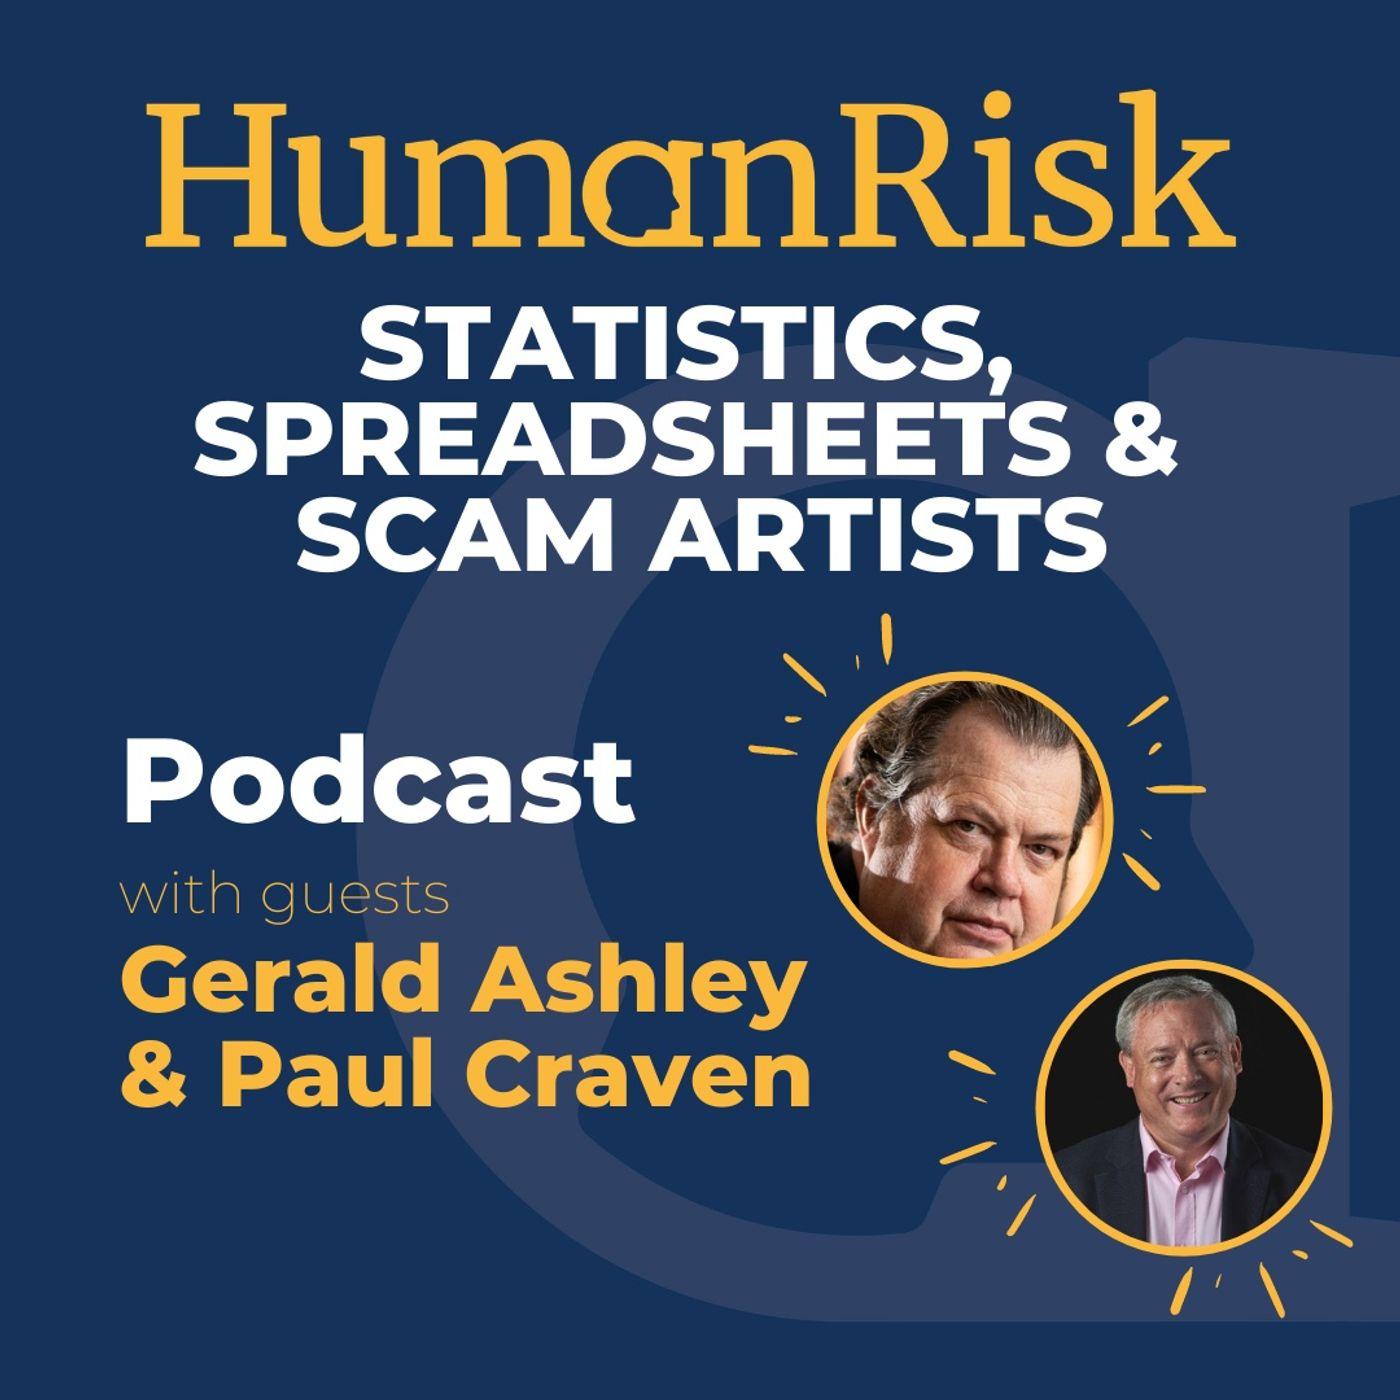 Gerald Ashley & Paul Craven on Statistics, Spreadsheets & Scam Artists